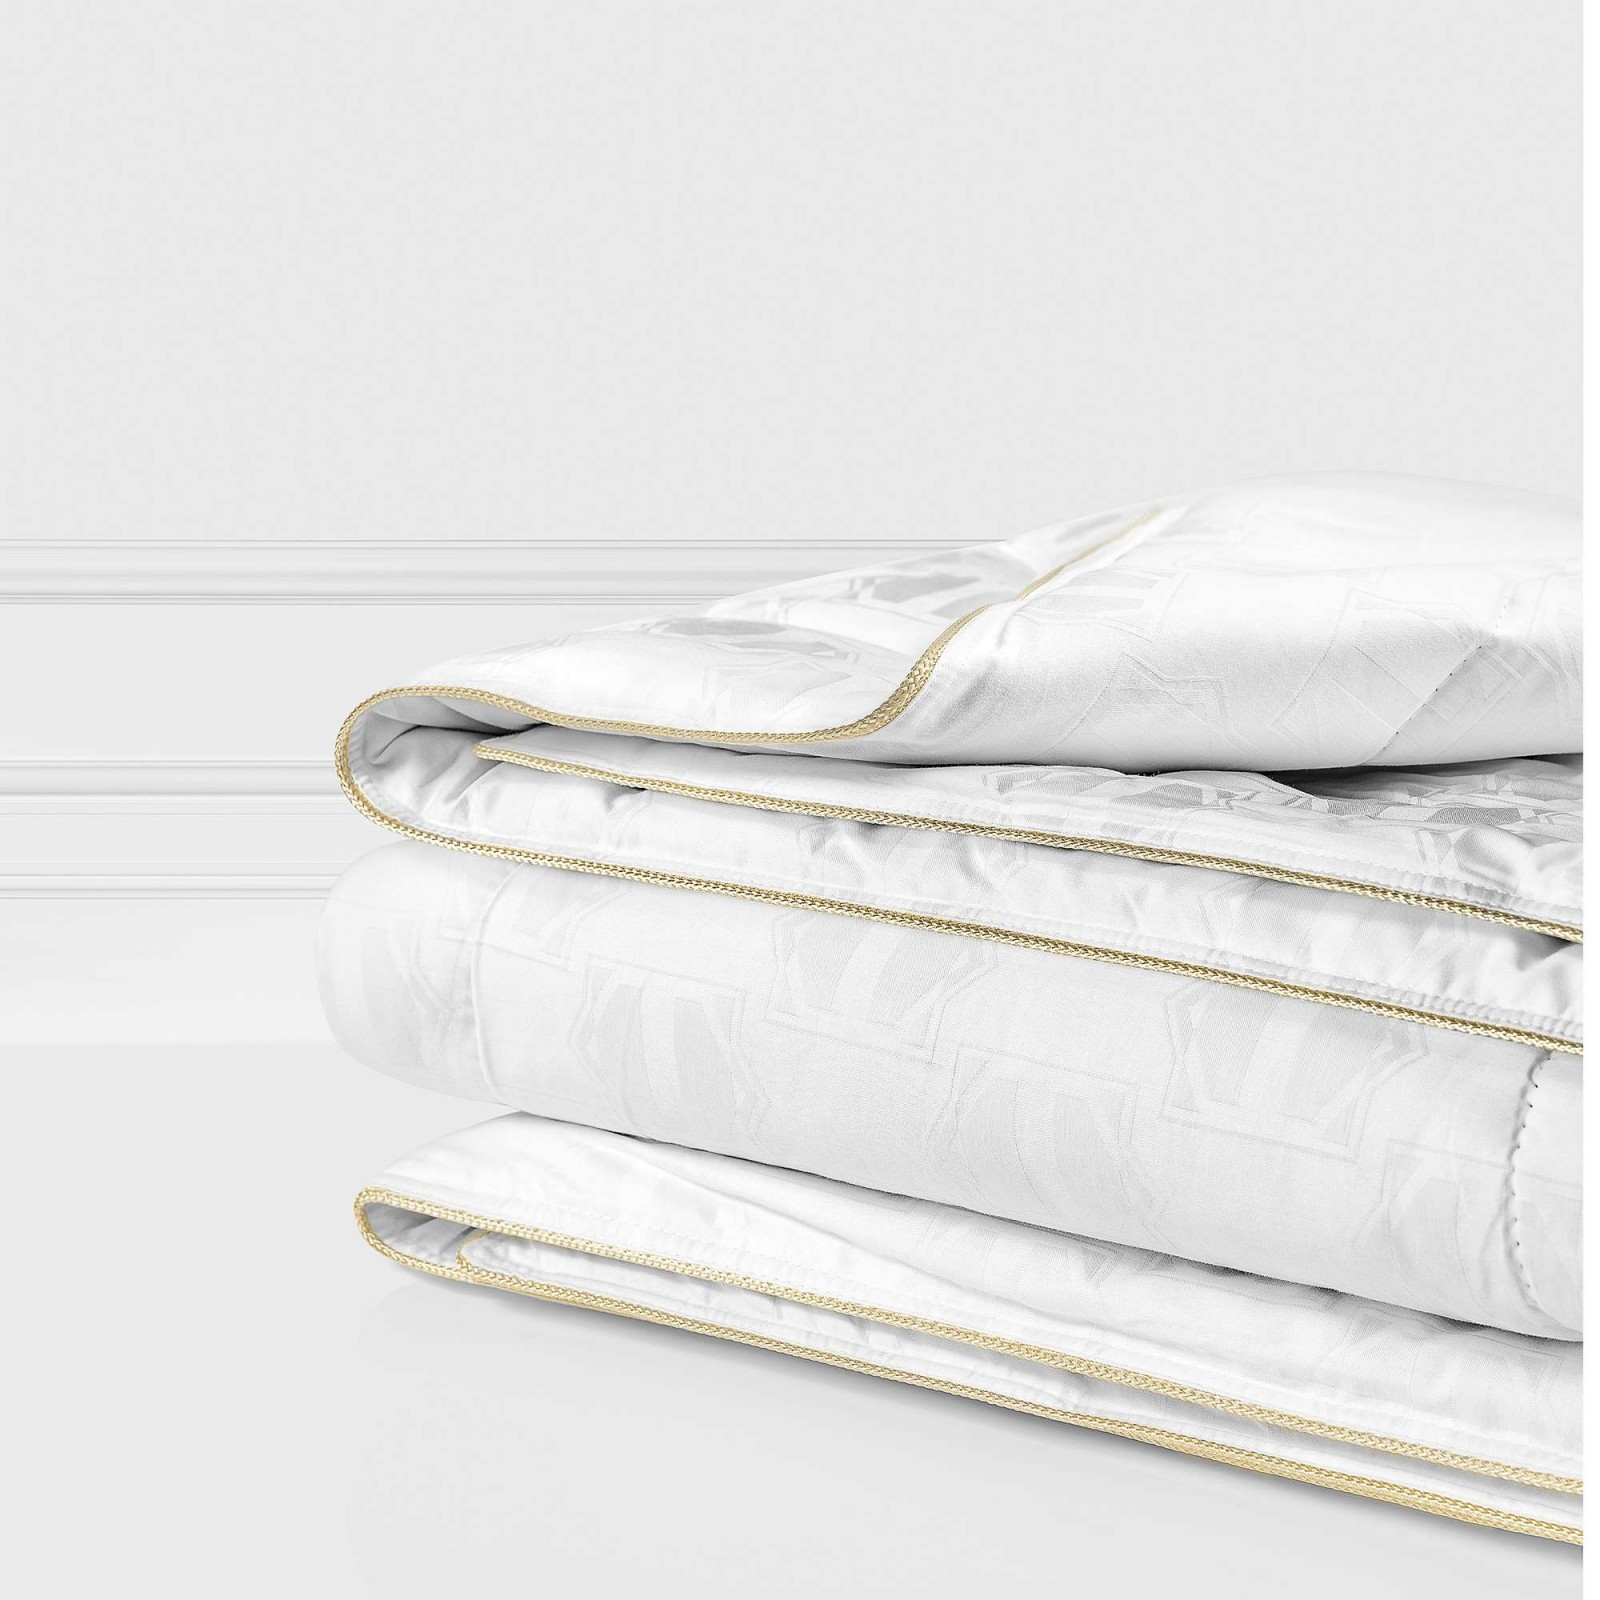 Одеяла Togas Одеяло Маэстро Всесезонное (220х240 см) одеяла togas одеяло гелиос 220х240 см